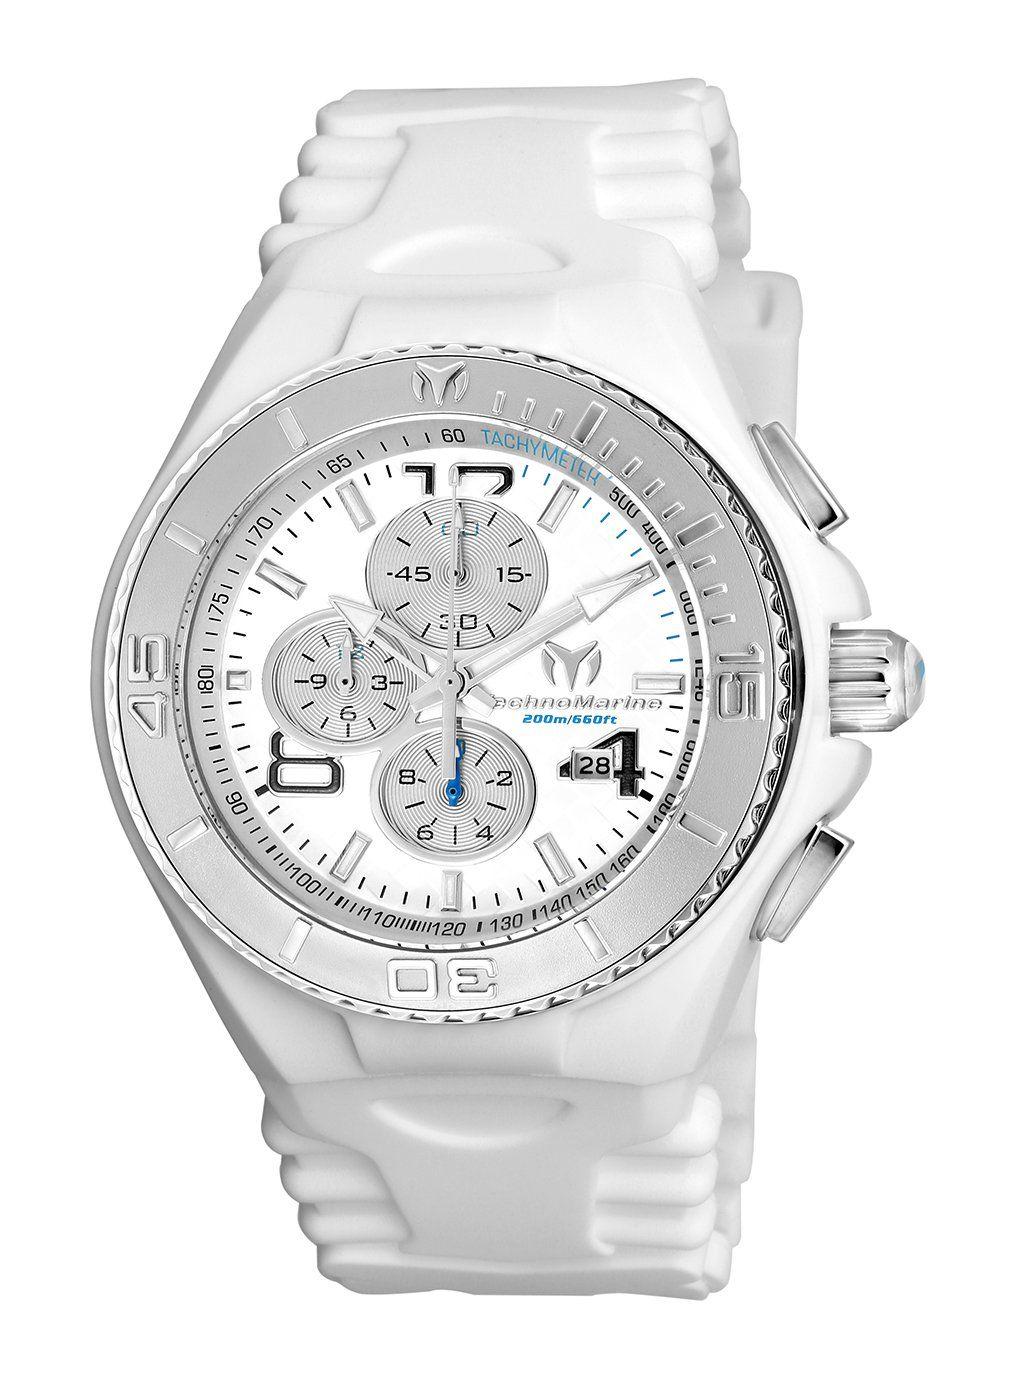 TR Men's TM-115108 Cruise JellyFish Quartz Silver Dial Watch